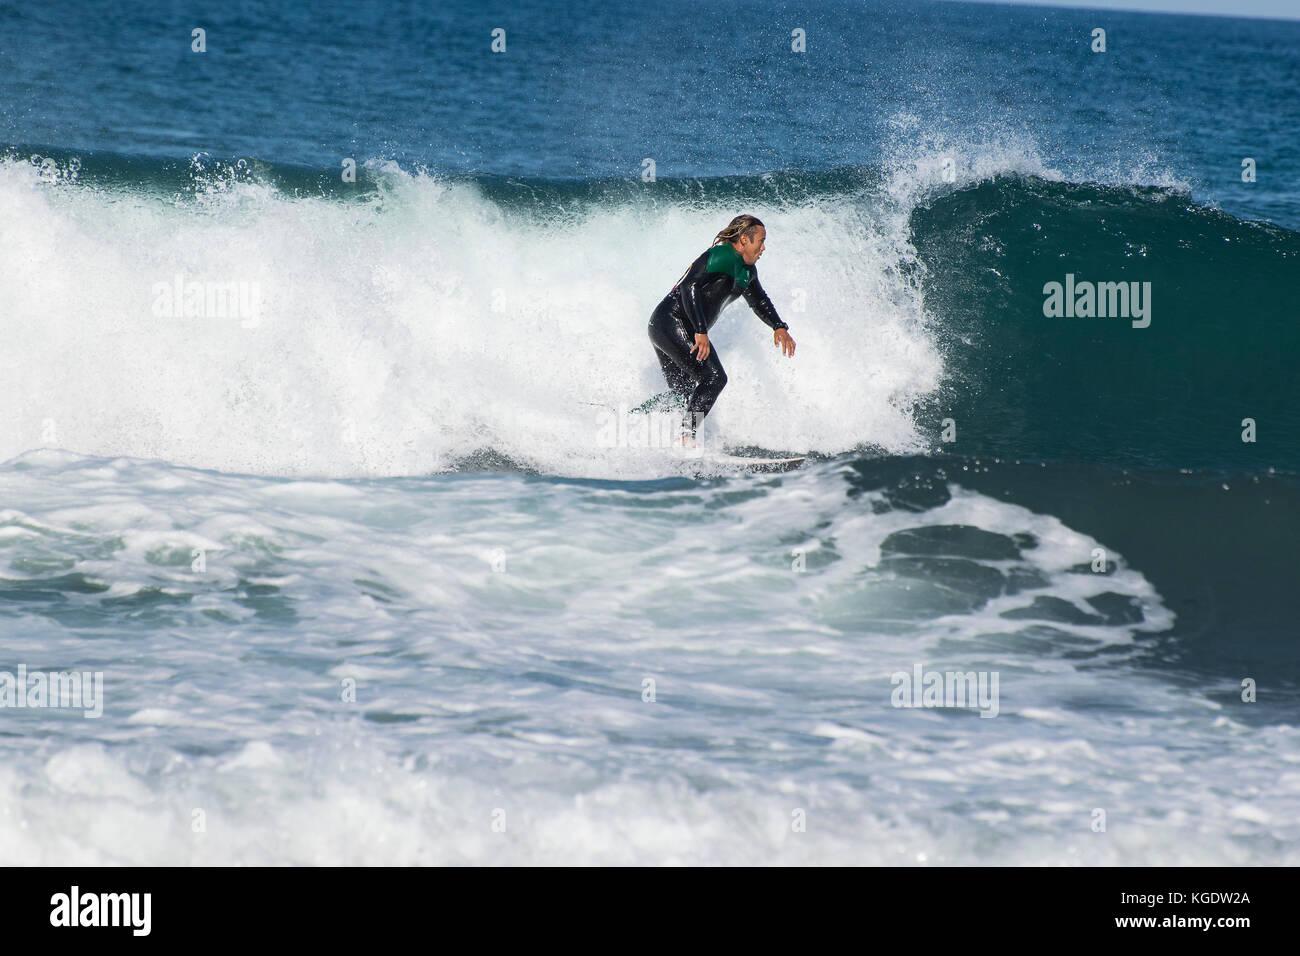 Surfer having fun in Son de Marina, Mallorca, Spain - Stock Image